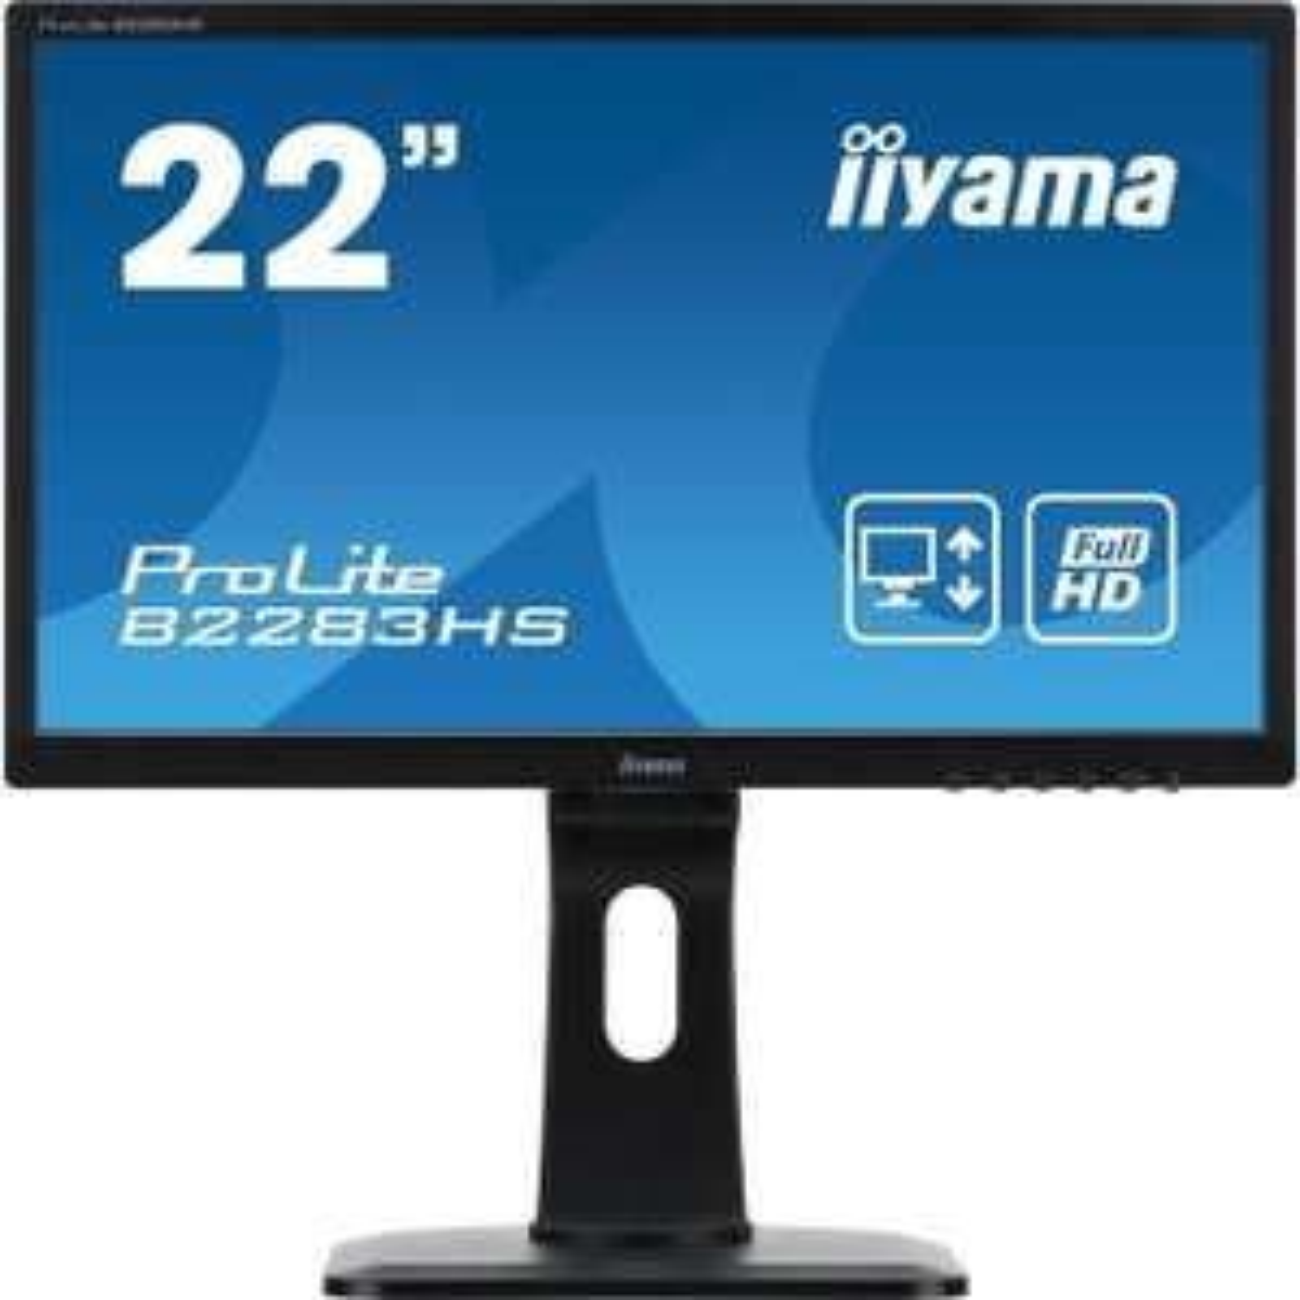 "Ecran PC 22"" Iiyama B2283HS-B1 2ms - Full HD"